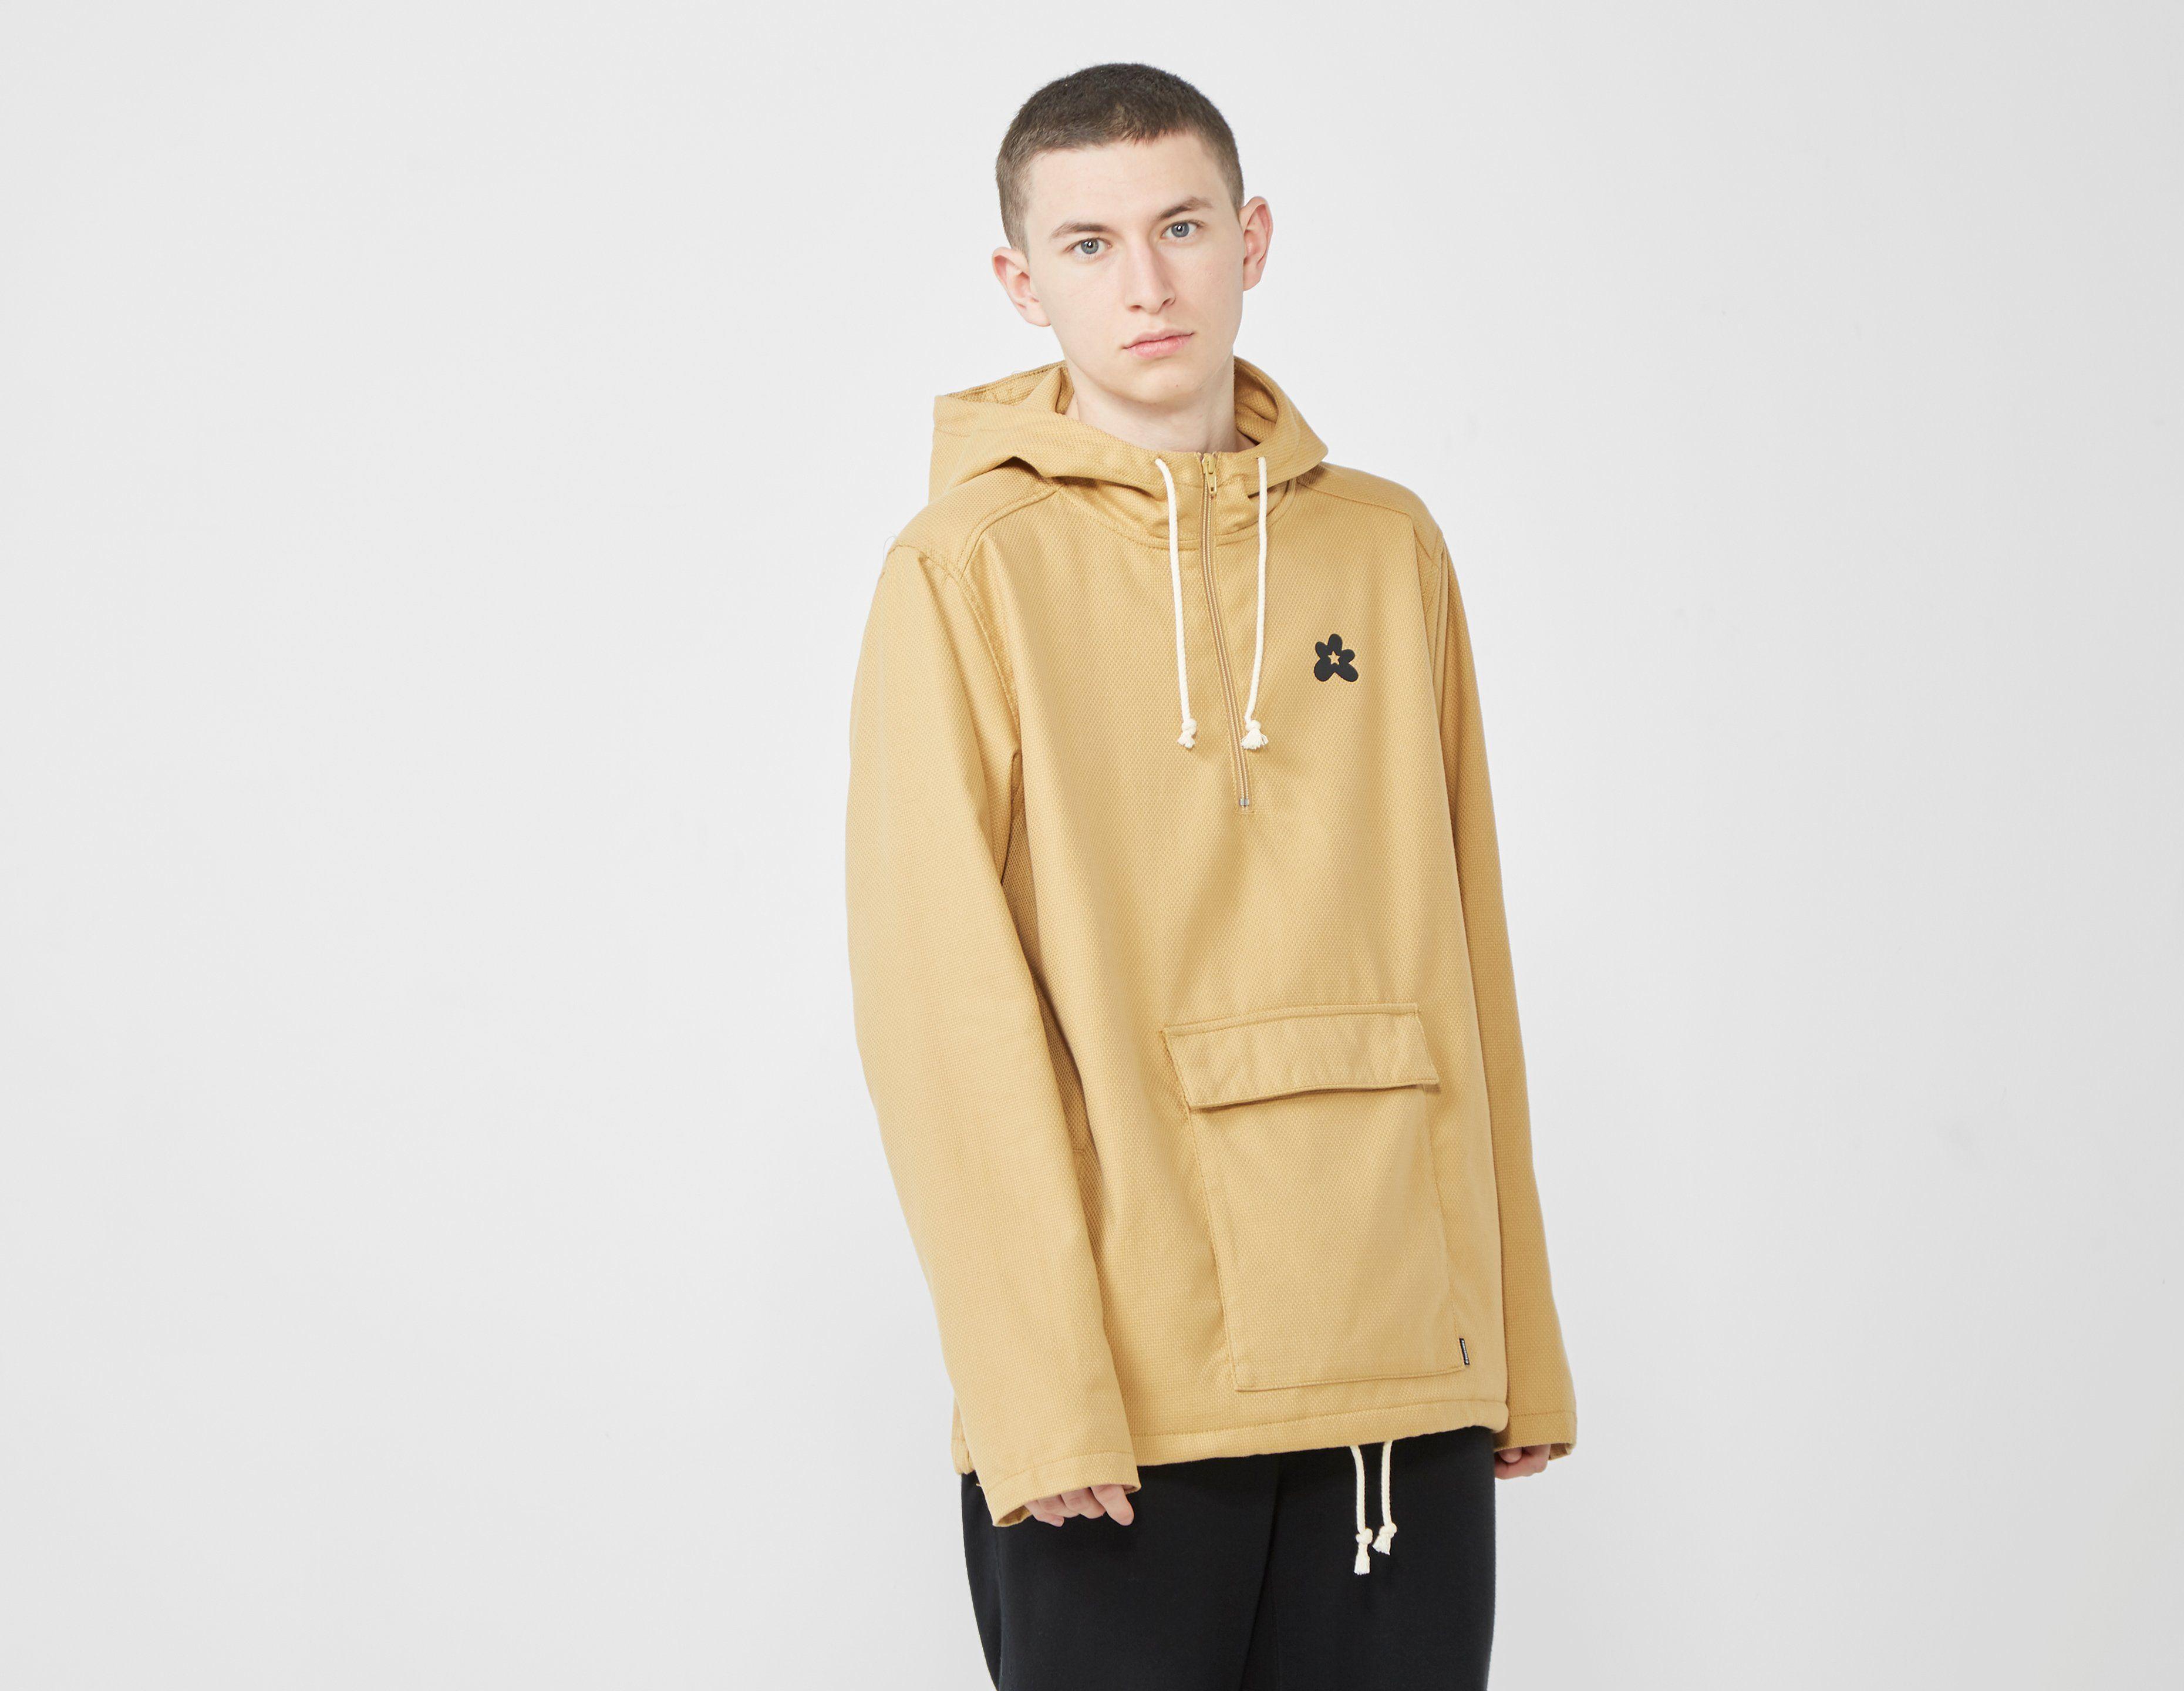 Converse x Tyler Golf Le Fleur Half-Zip Jacket